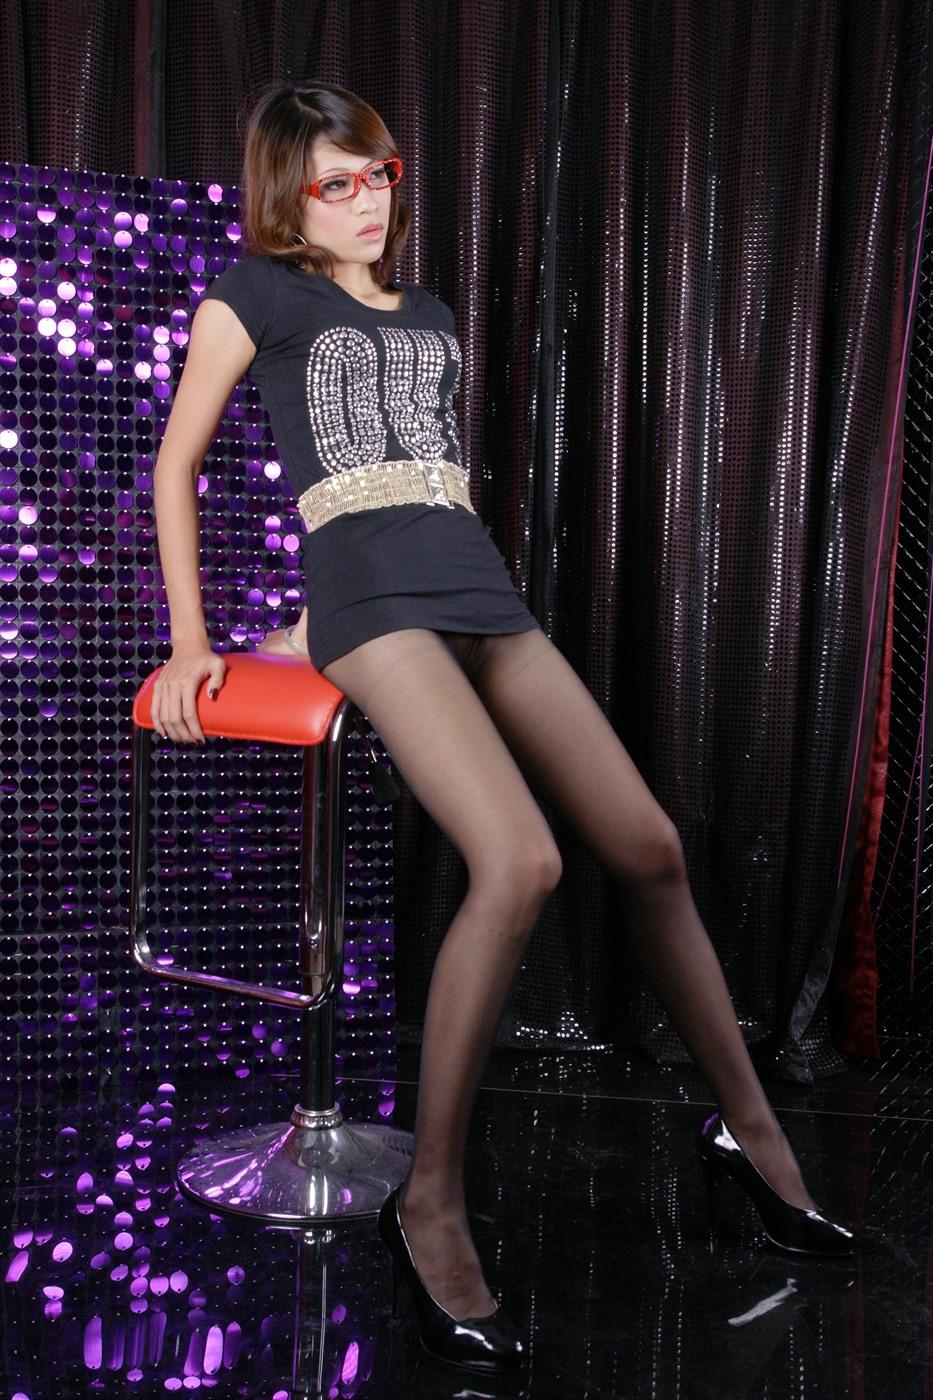 IMG 0017 - 82 Taiwan Model Jieli Juicy Pussy